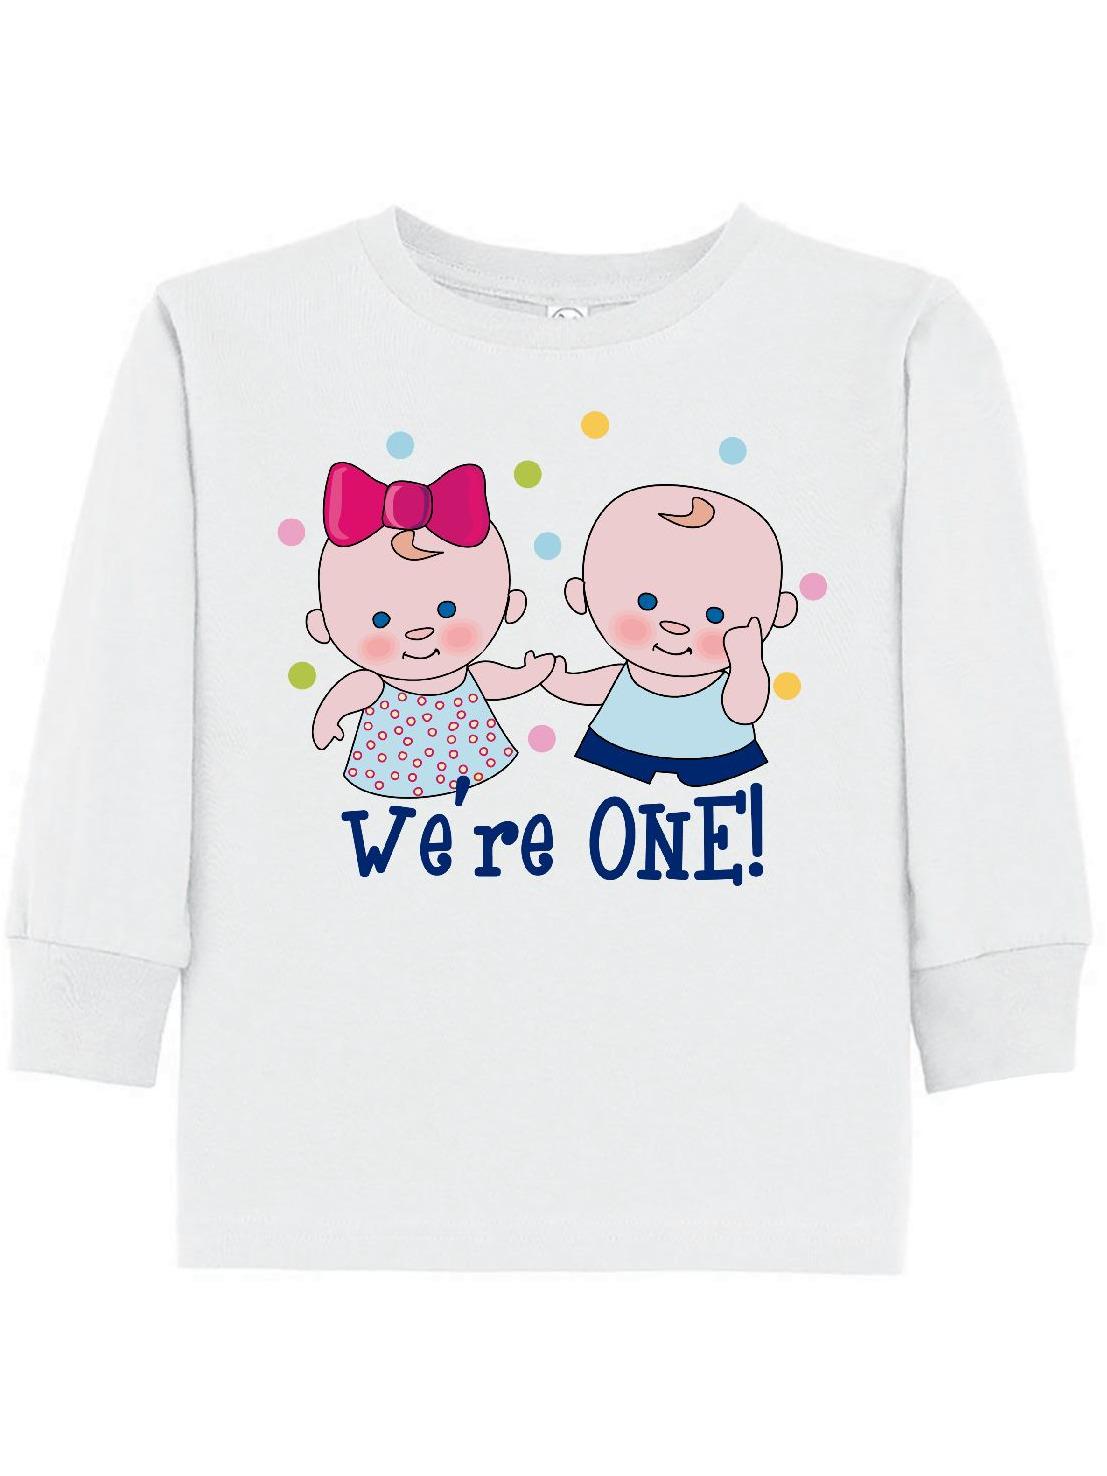 We're One Twin Boy & Girl Toddler Long Sleeve T-Shirt